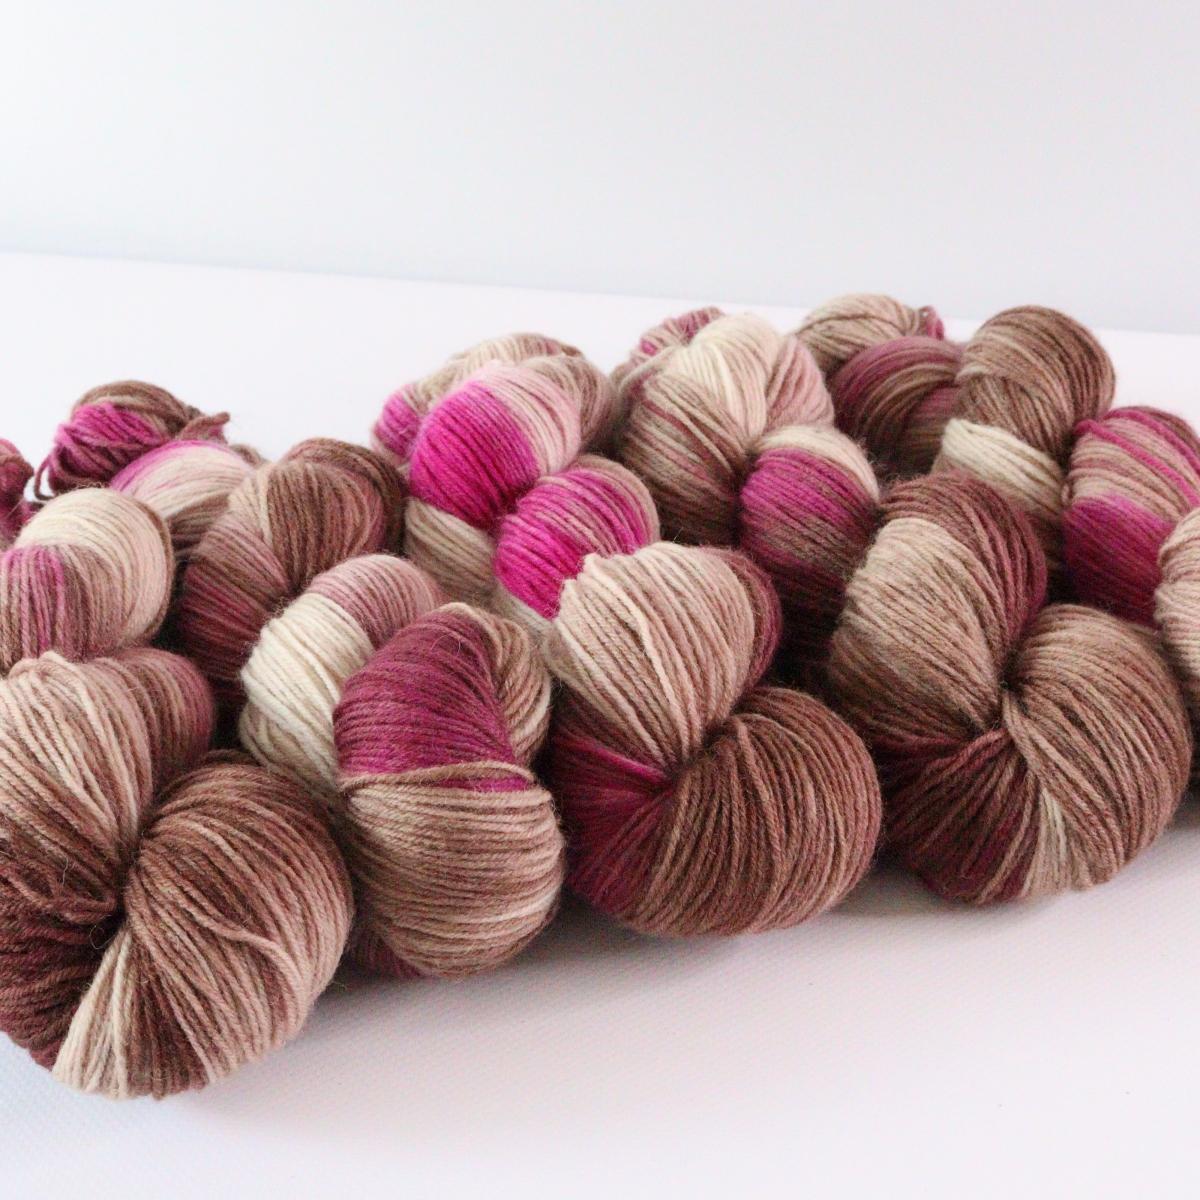 woodico.pro hand dyed yarn 073 1200x1200 - Hand dyed yarn / 073